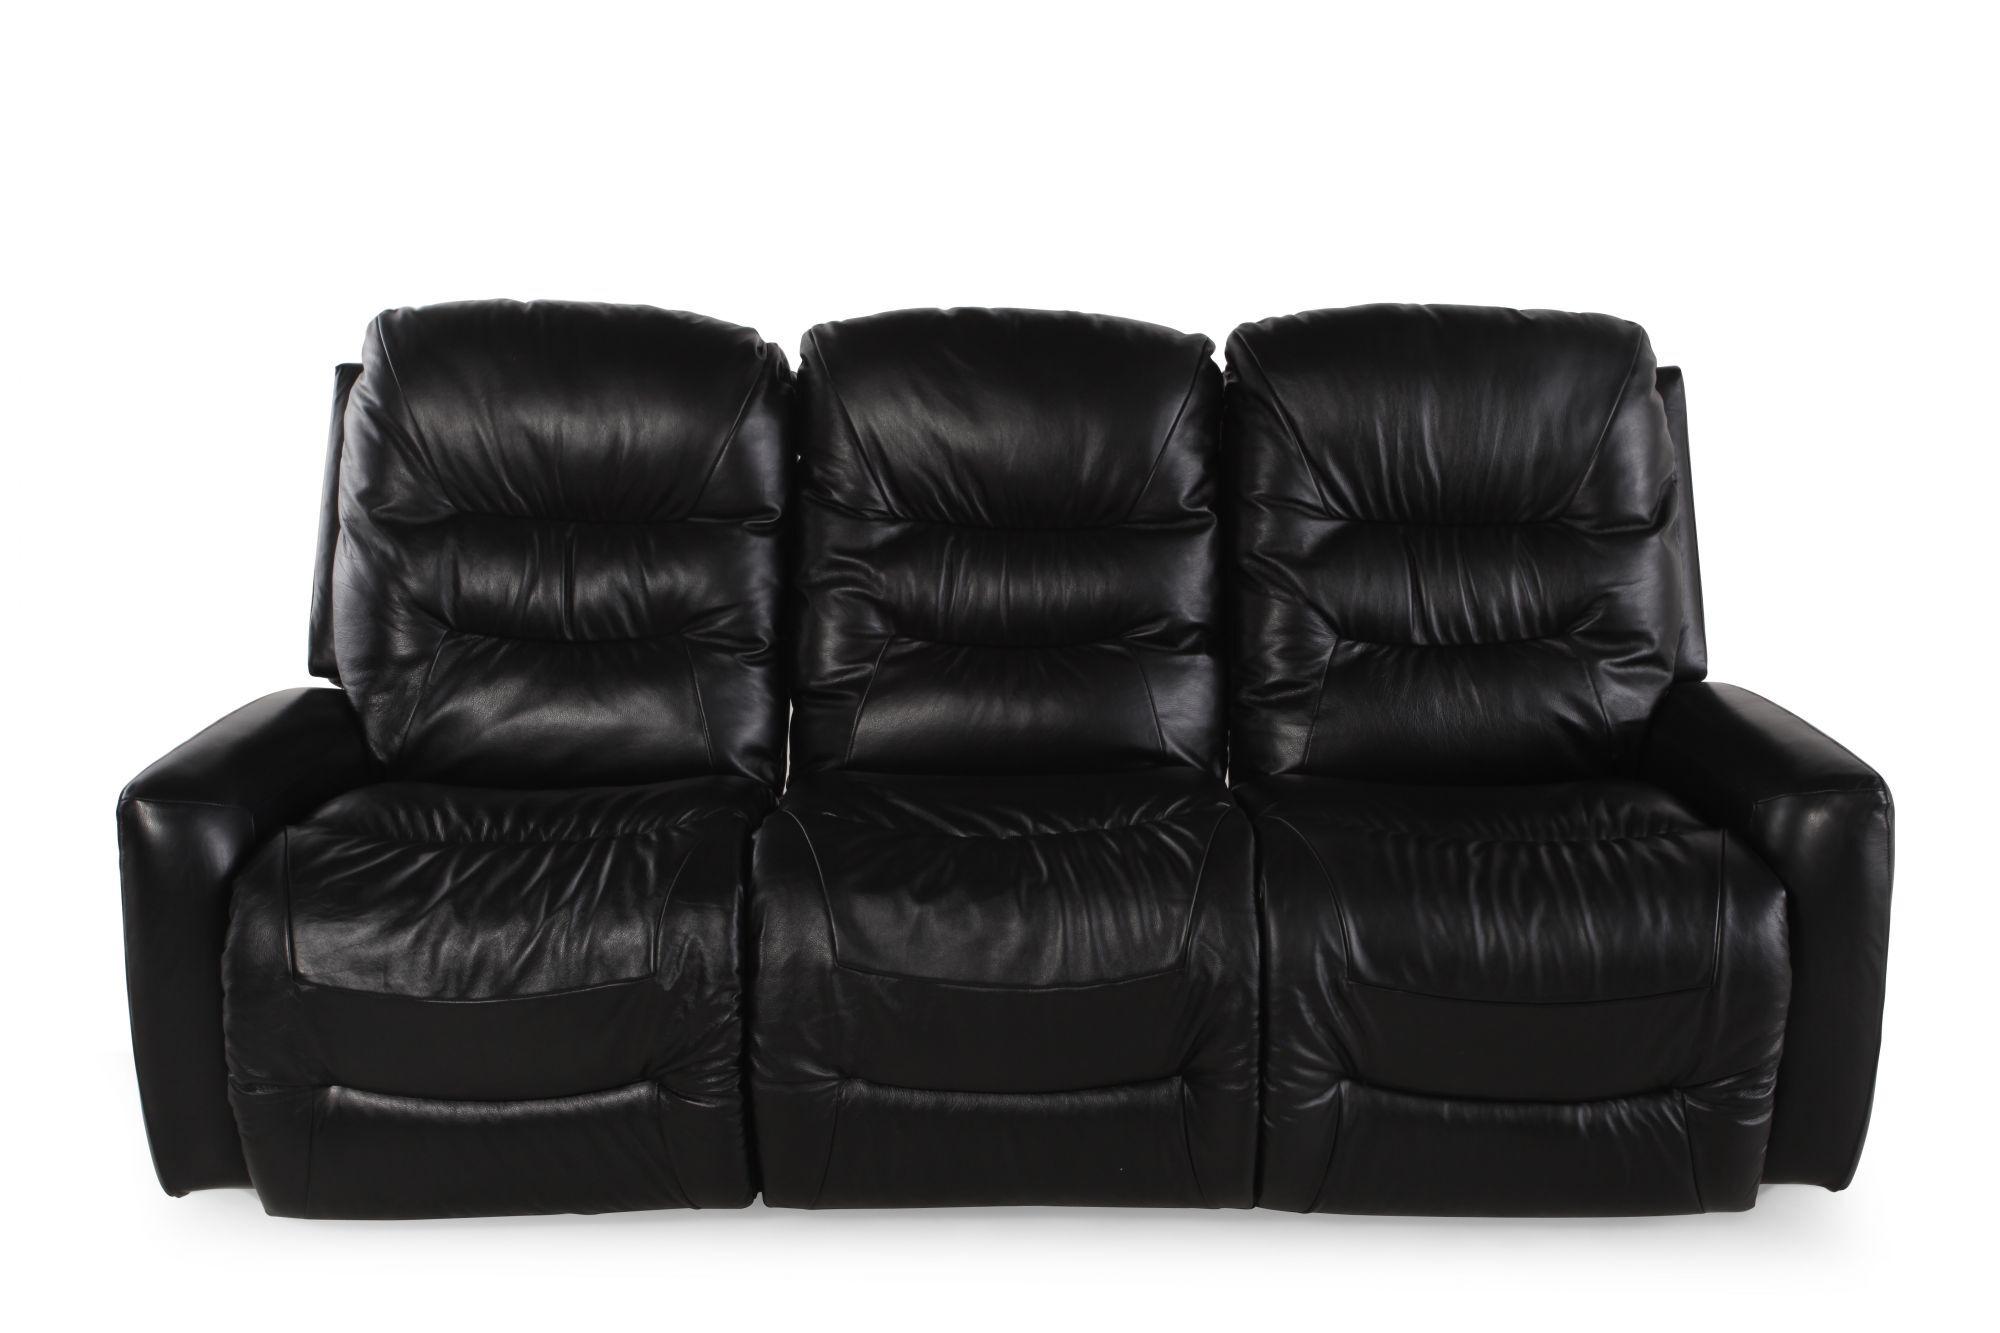 La-Z-Boy Ace Black Reclining Sofa  sc 1 st  Mathis Brothers & La-Z-Boy Ace Black Reclining Sofa | Mathis Brothers Furniture islam-shia.org